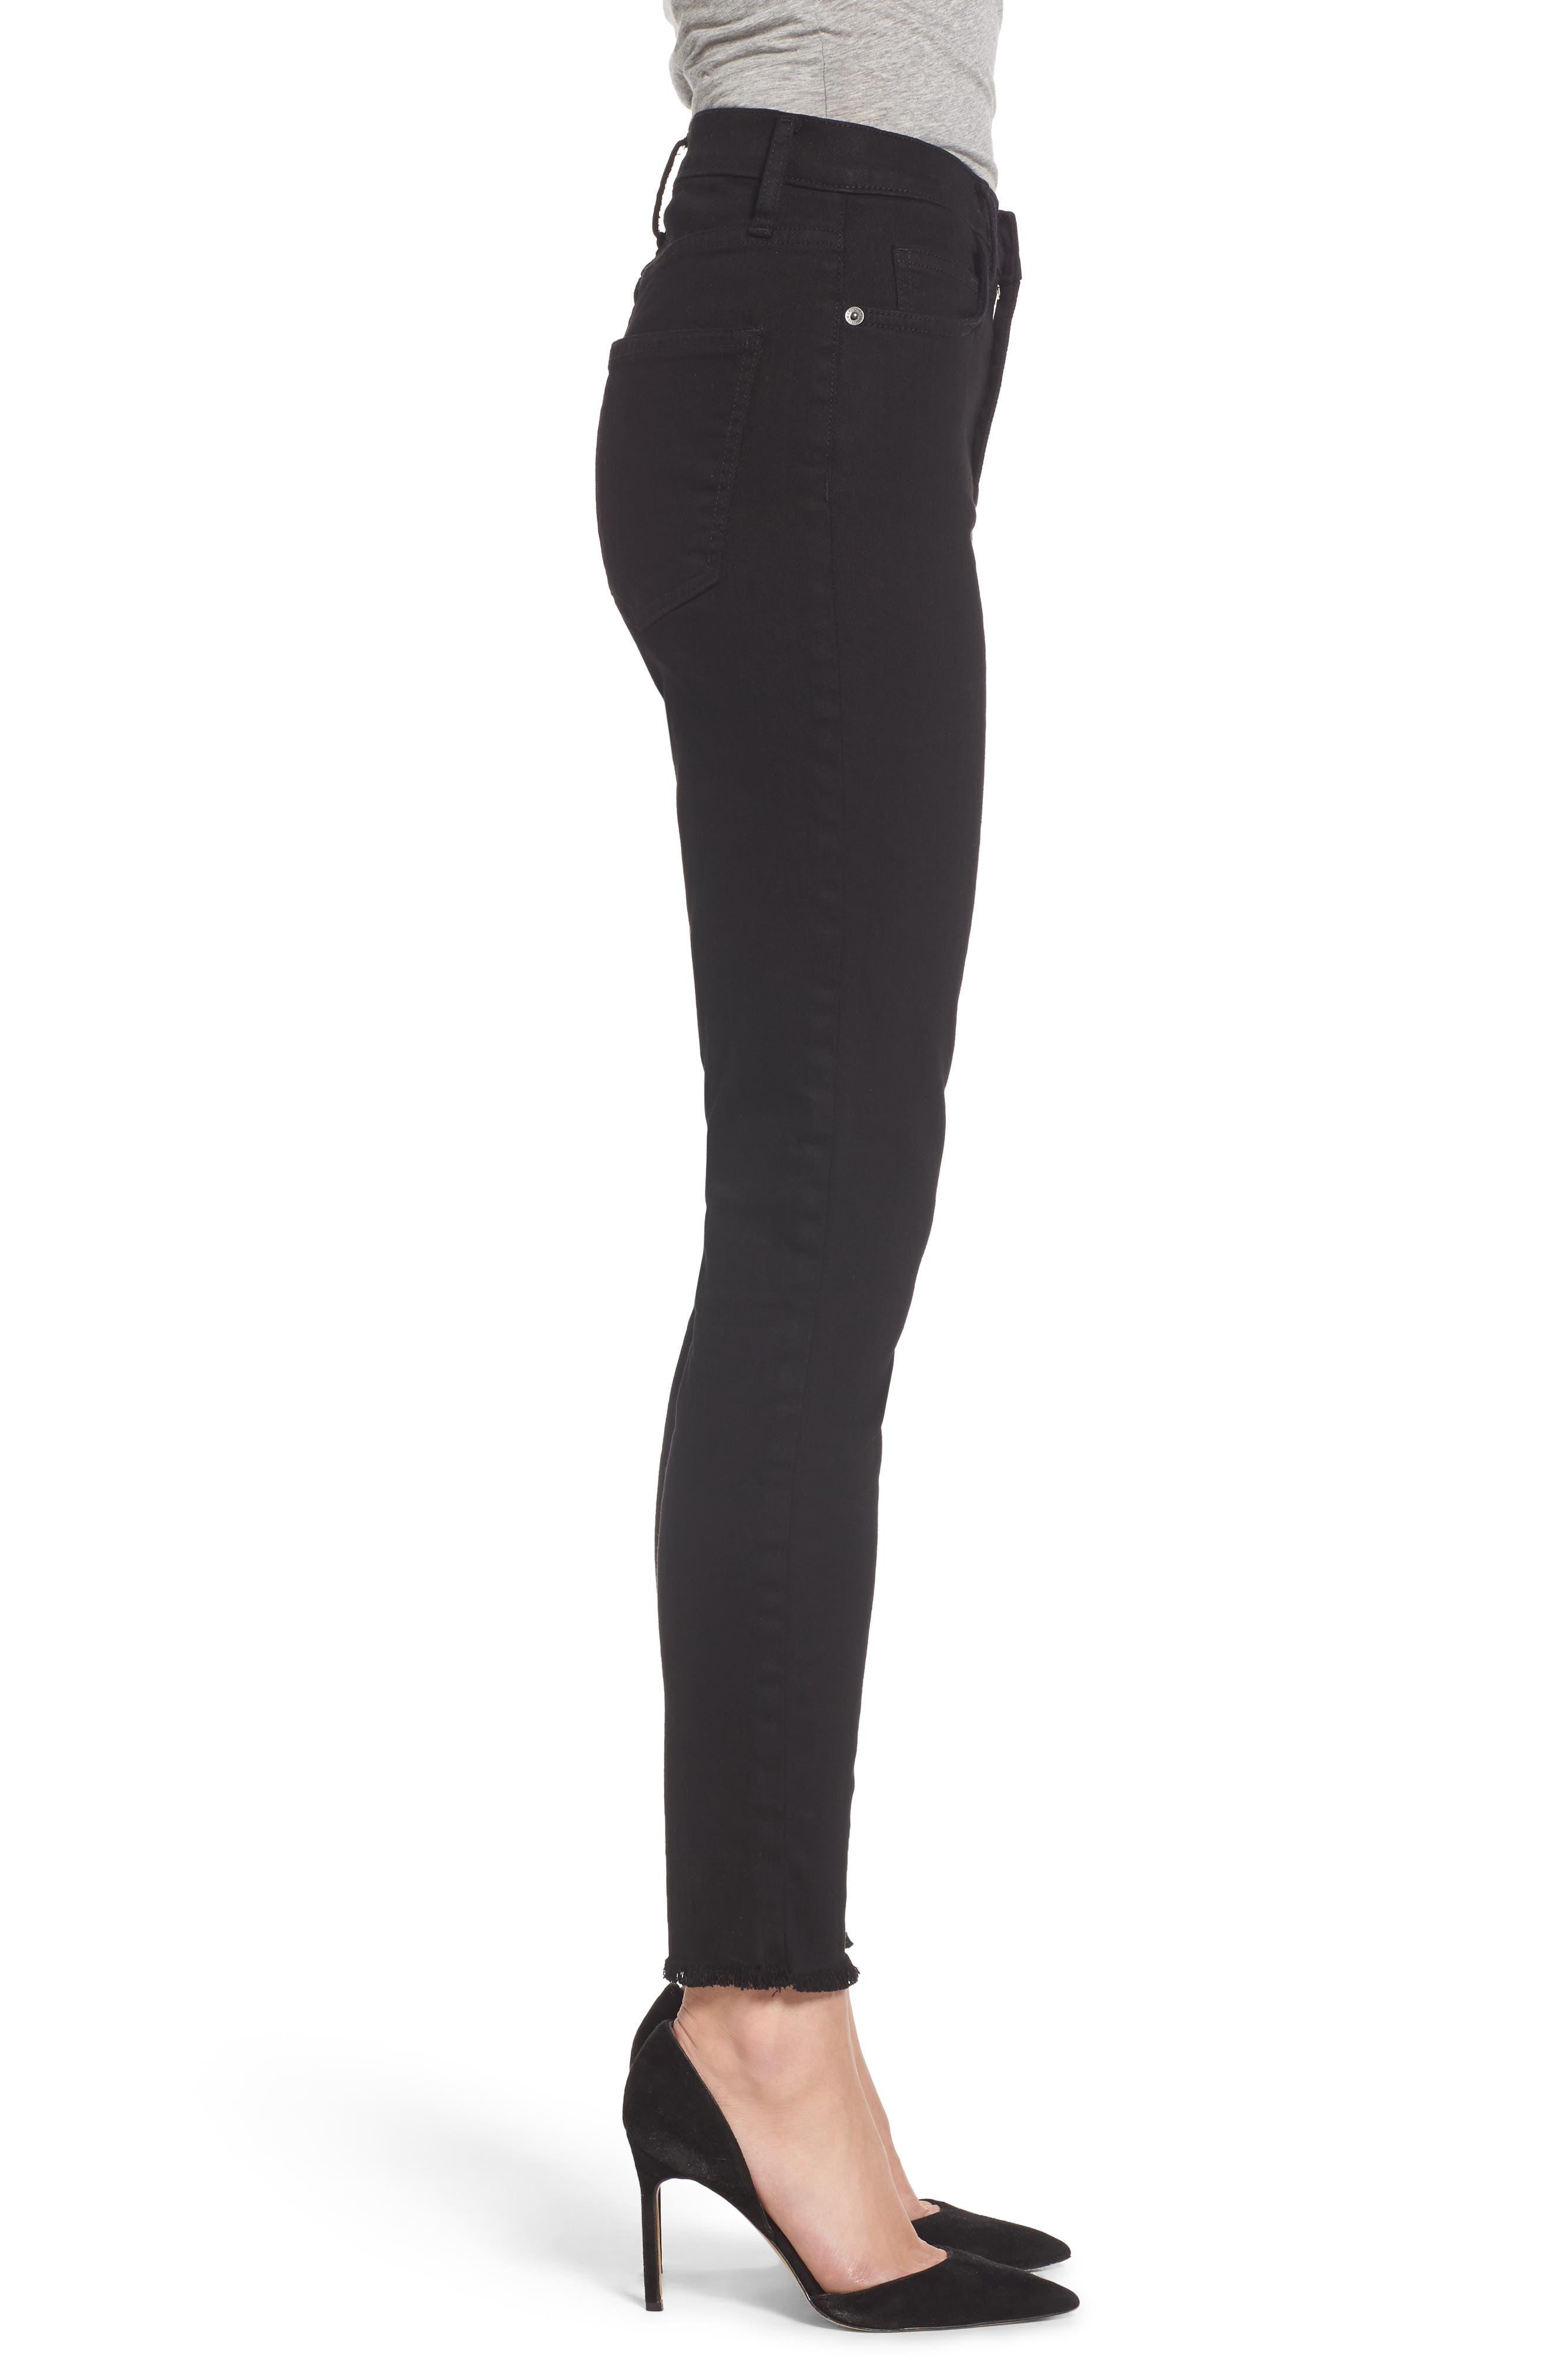 The Super High Waist Stiletto Ankle Skinny Jeans,                             Alternate thumbnail 3, color,                             Jet Black